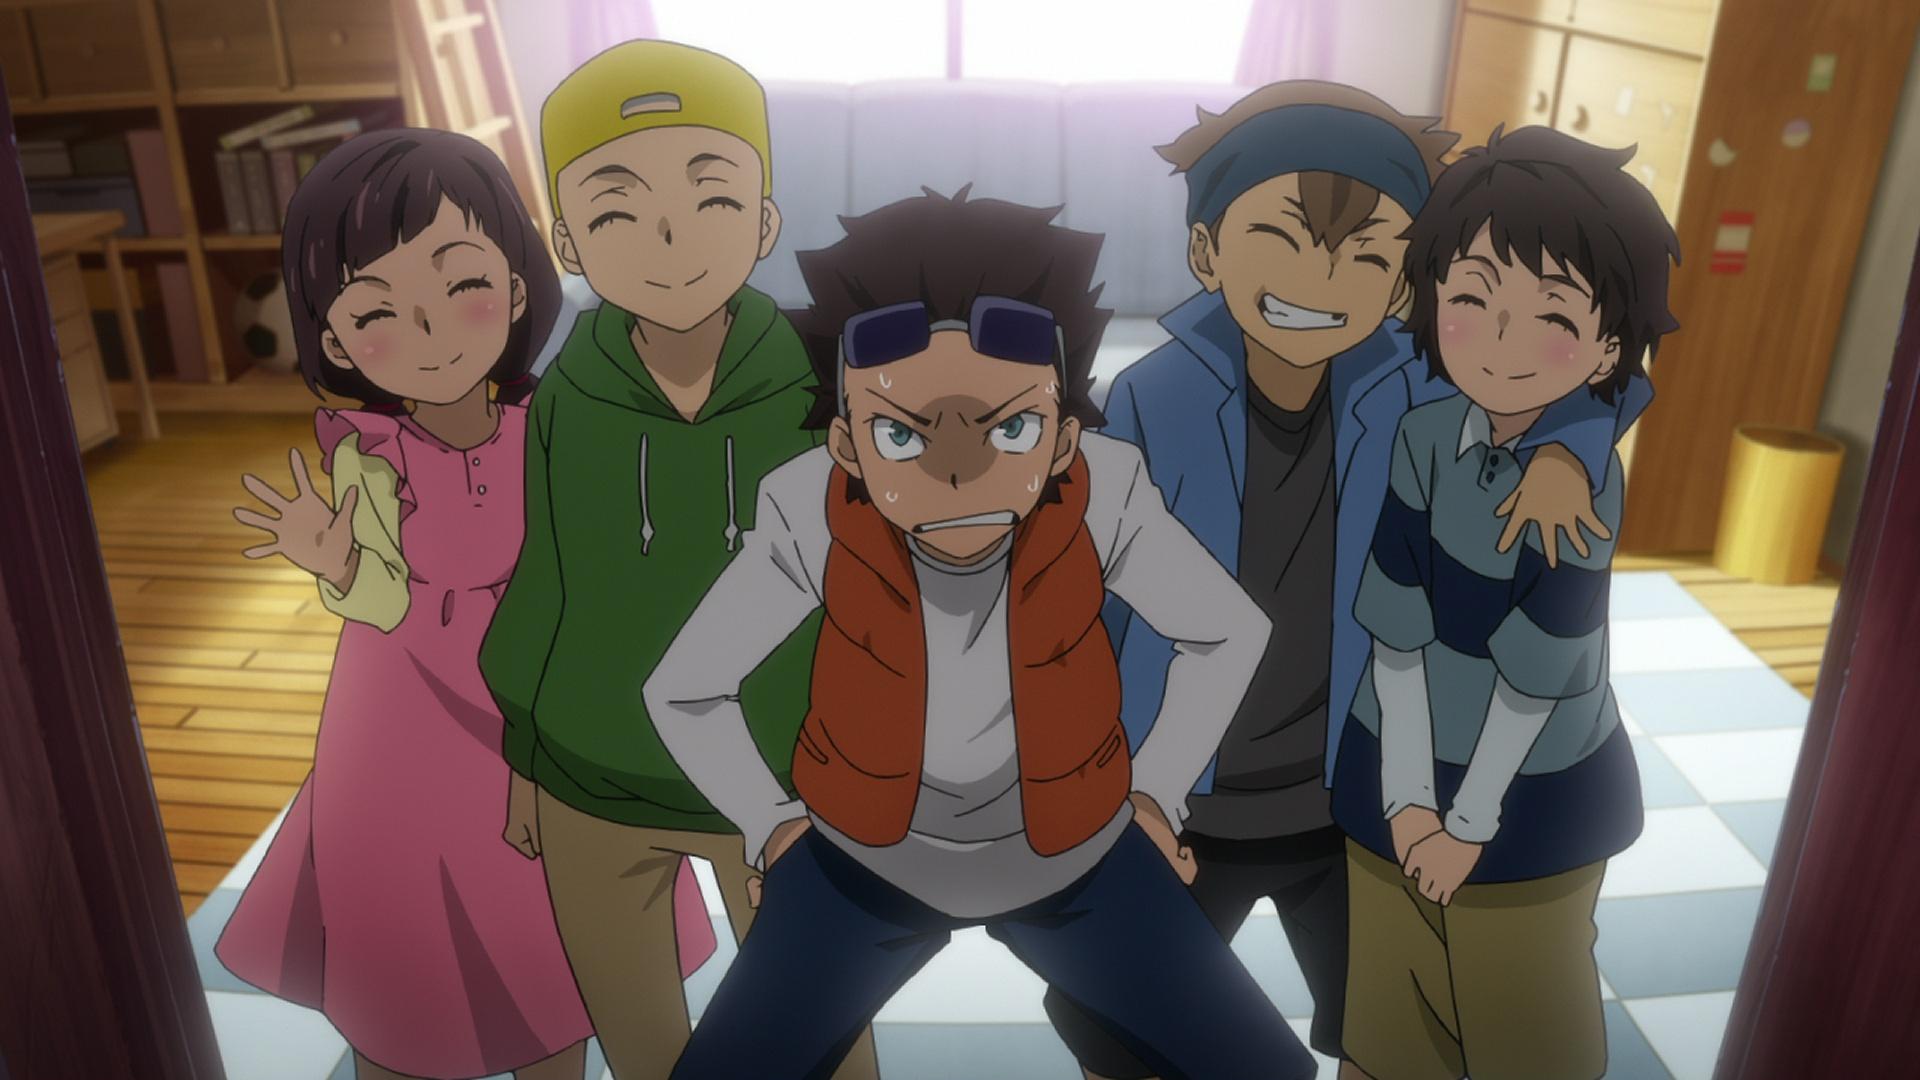 Watch Bungo Stray Dogs Season 2 Episode 14 Sub Dub Anime Uncut Funimation